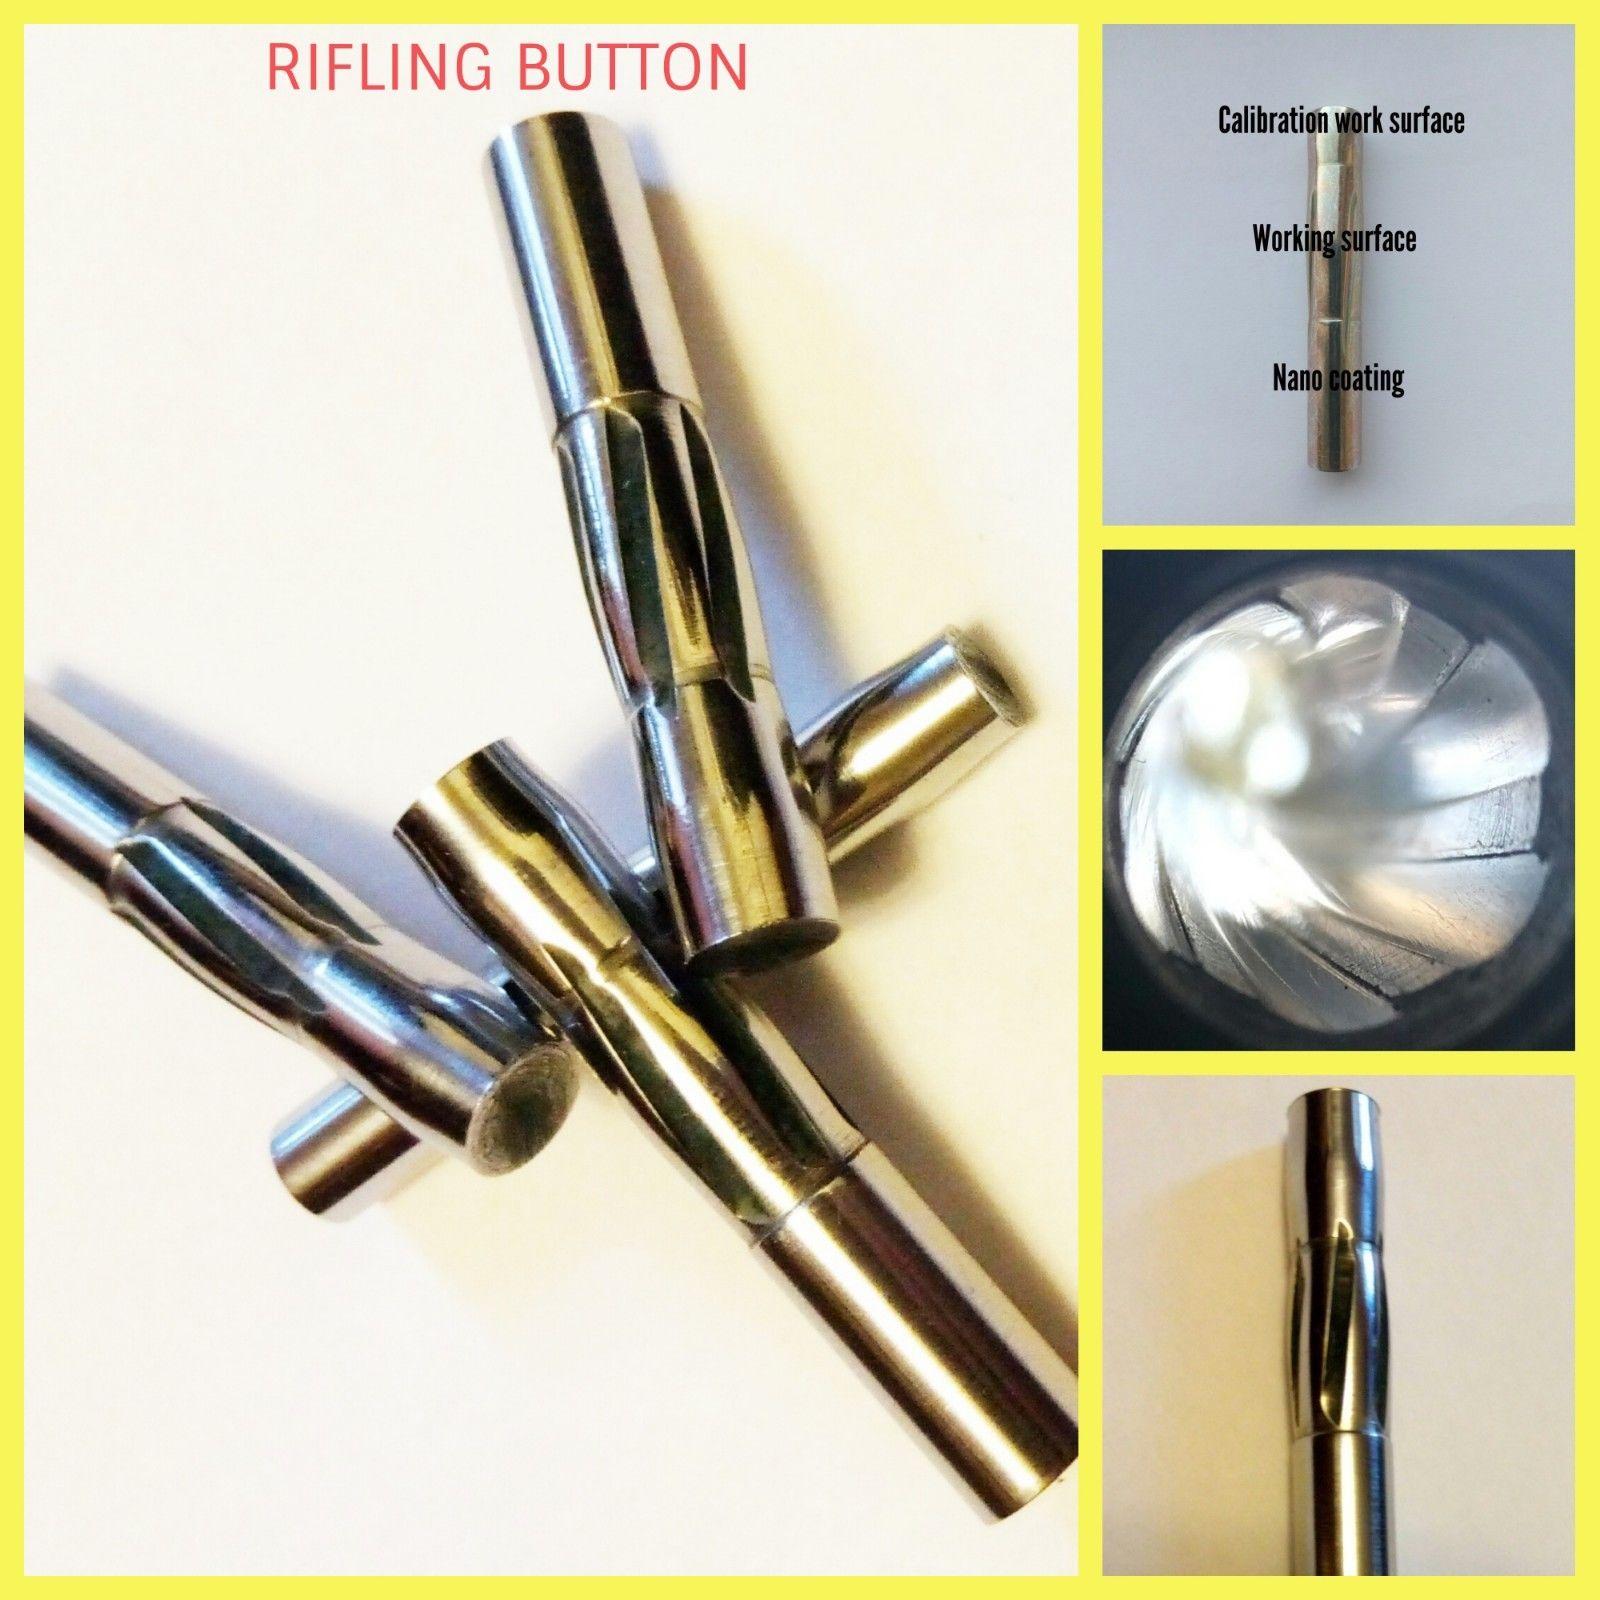 s l1600 1 - Rifling button combo 32 acp